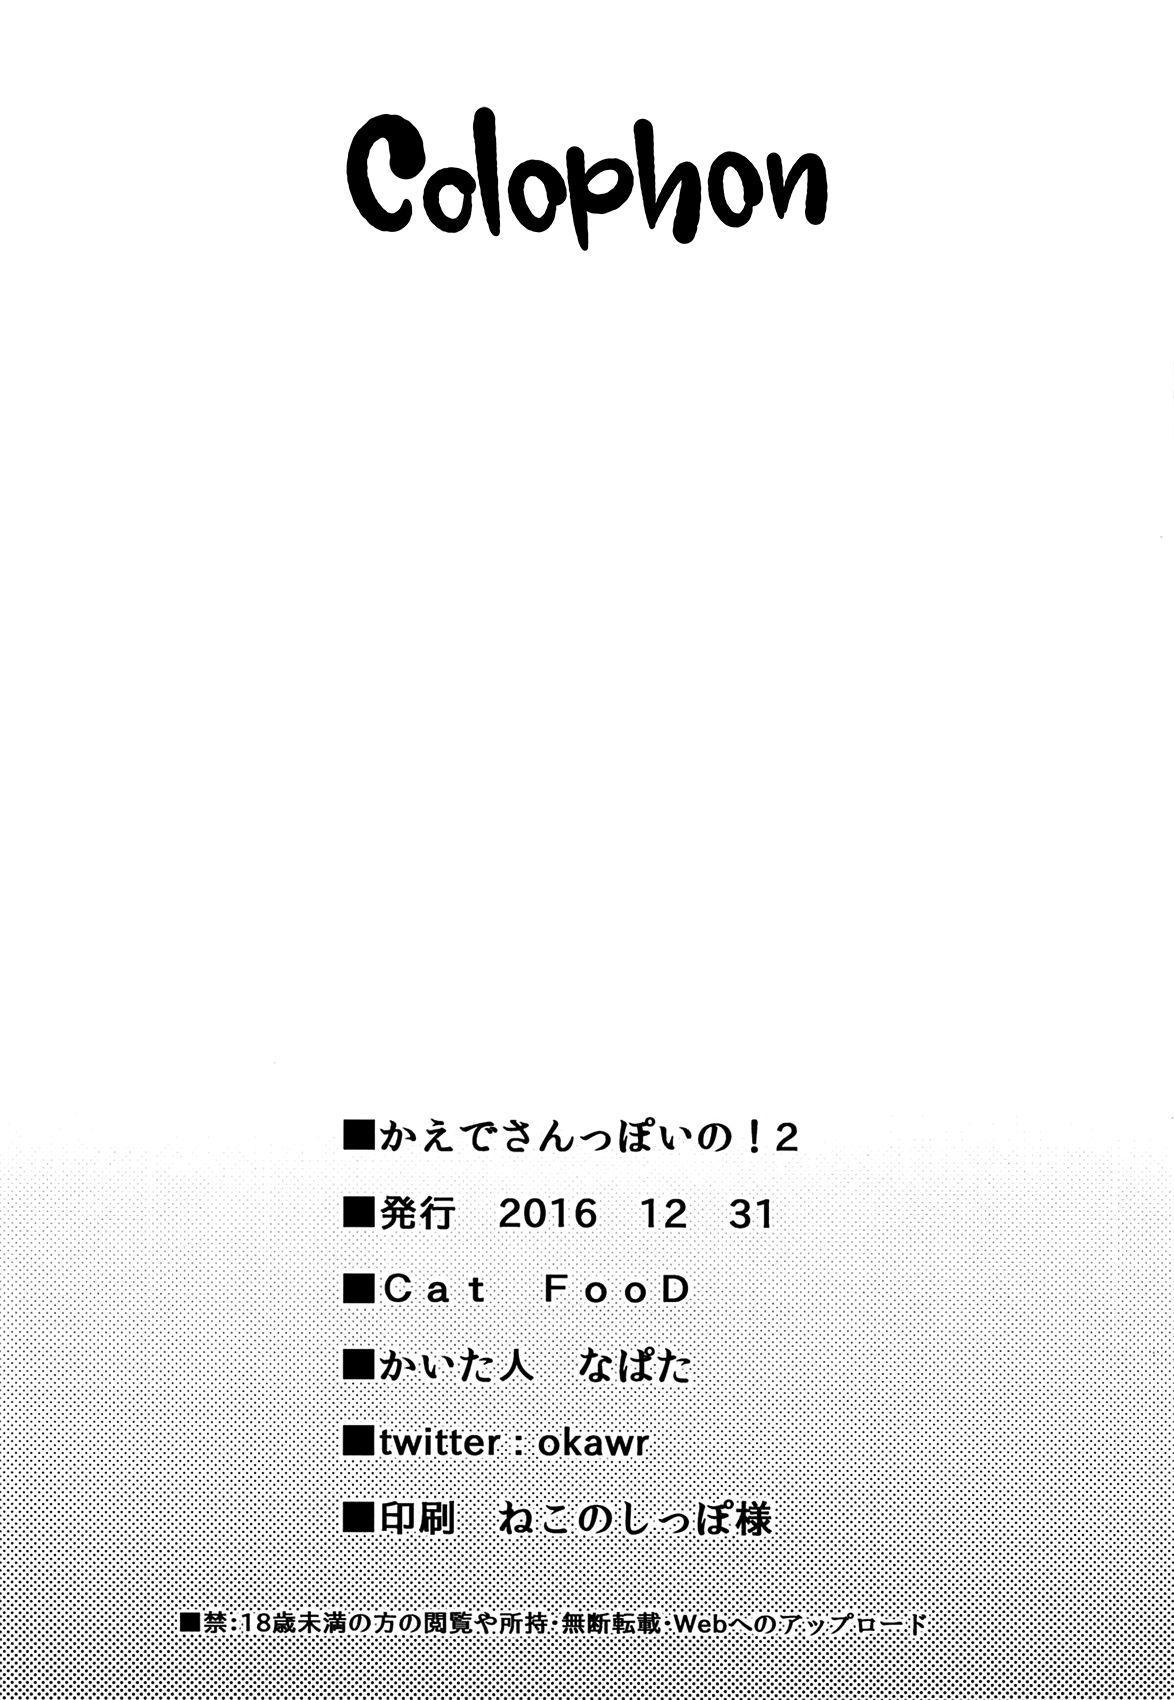 (C91) [Cat FooD (Napata)] Kaede-san-ppoi no! 2 | How Kaede! 2 (THE IDOLM@STER CINDERELLA GIRLS) [English] [Rotoscopic + Nero] 16